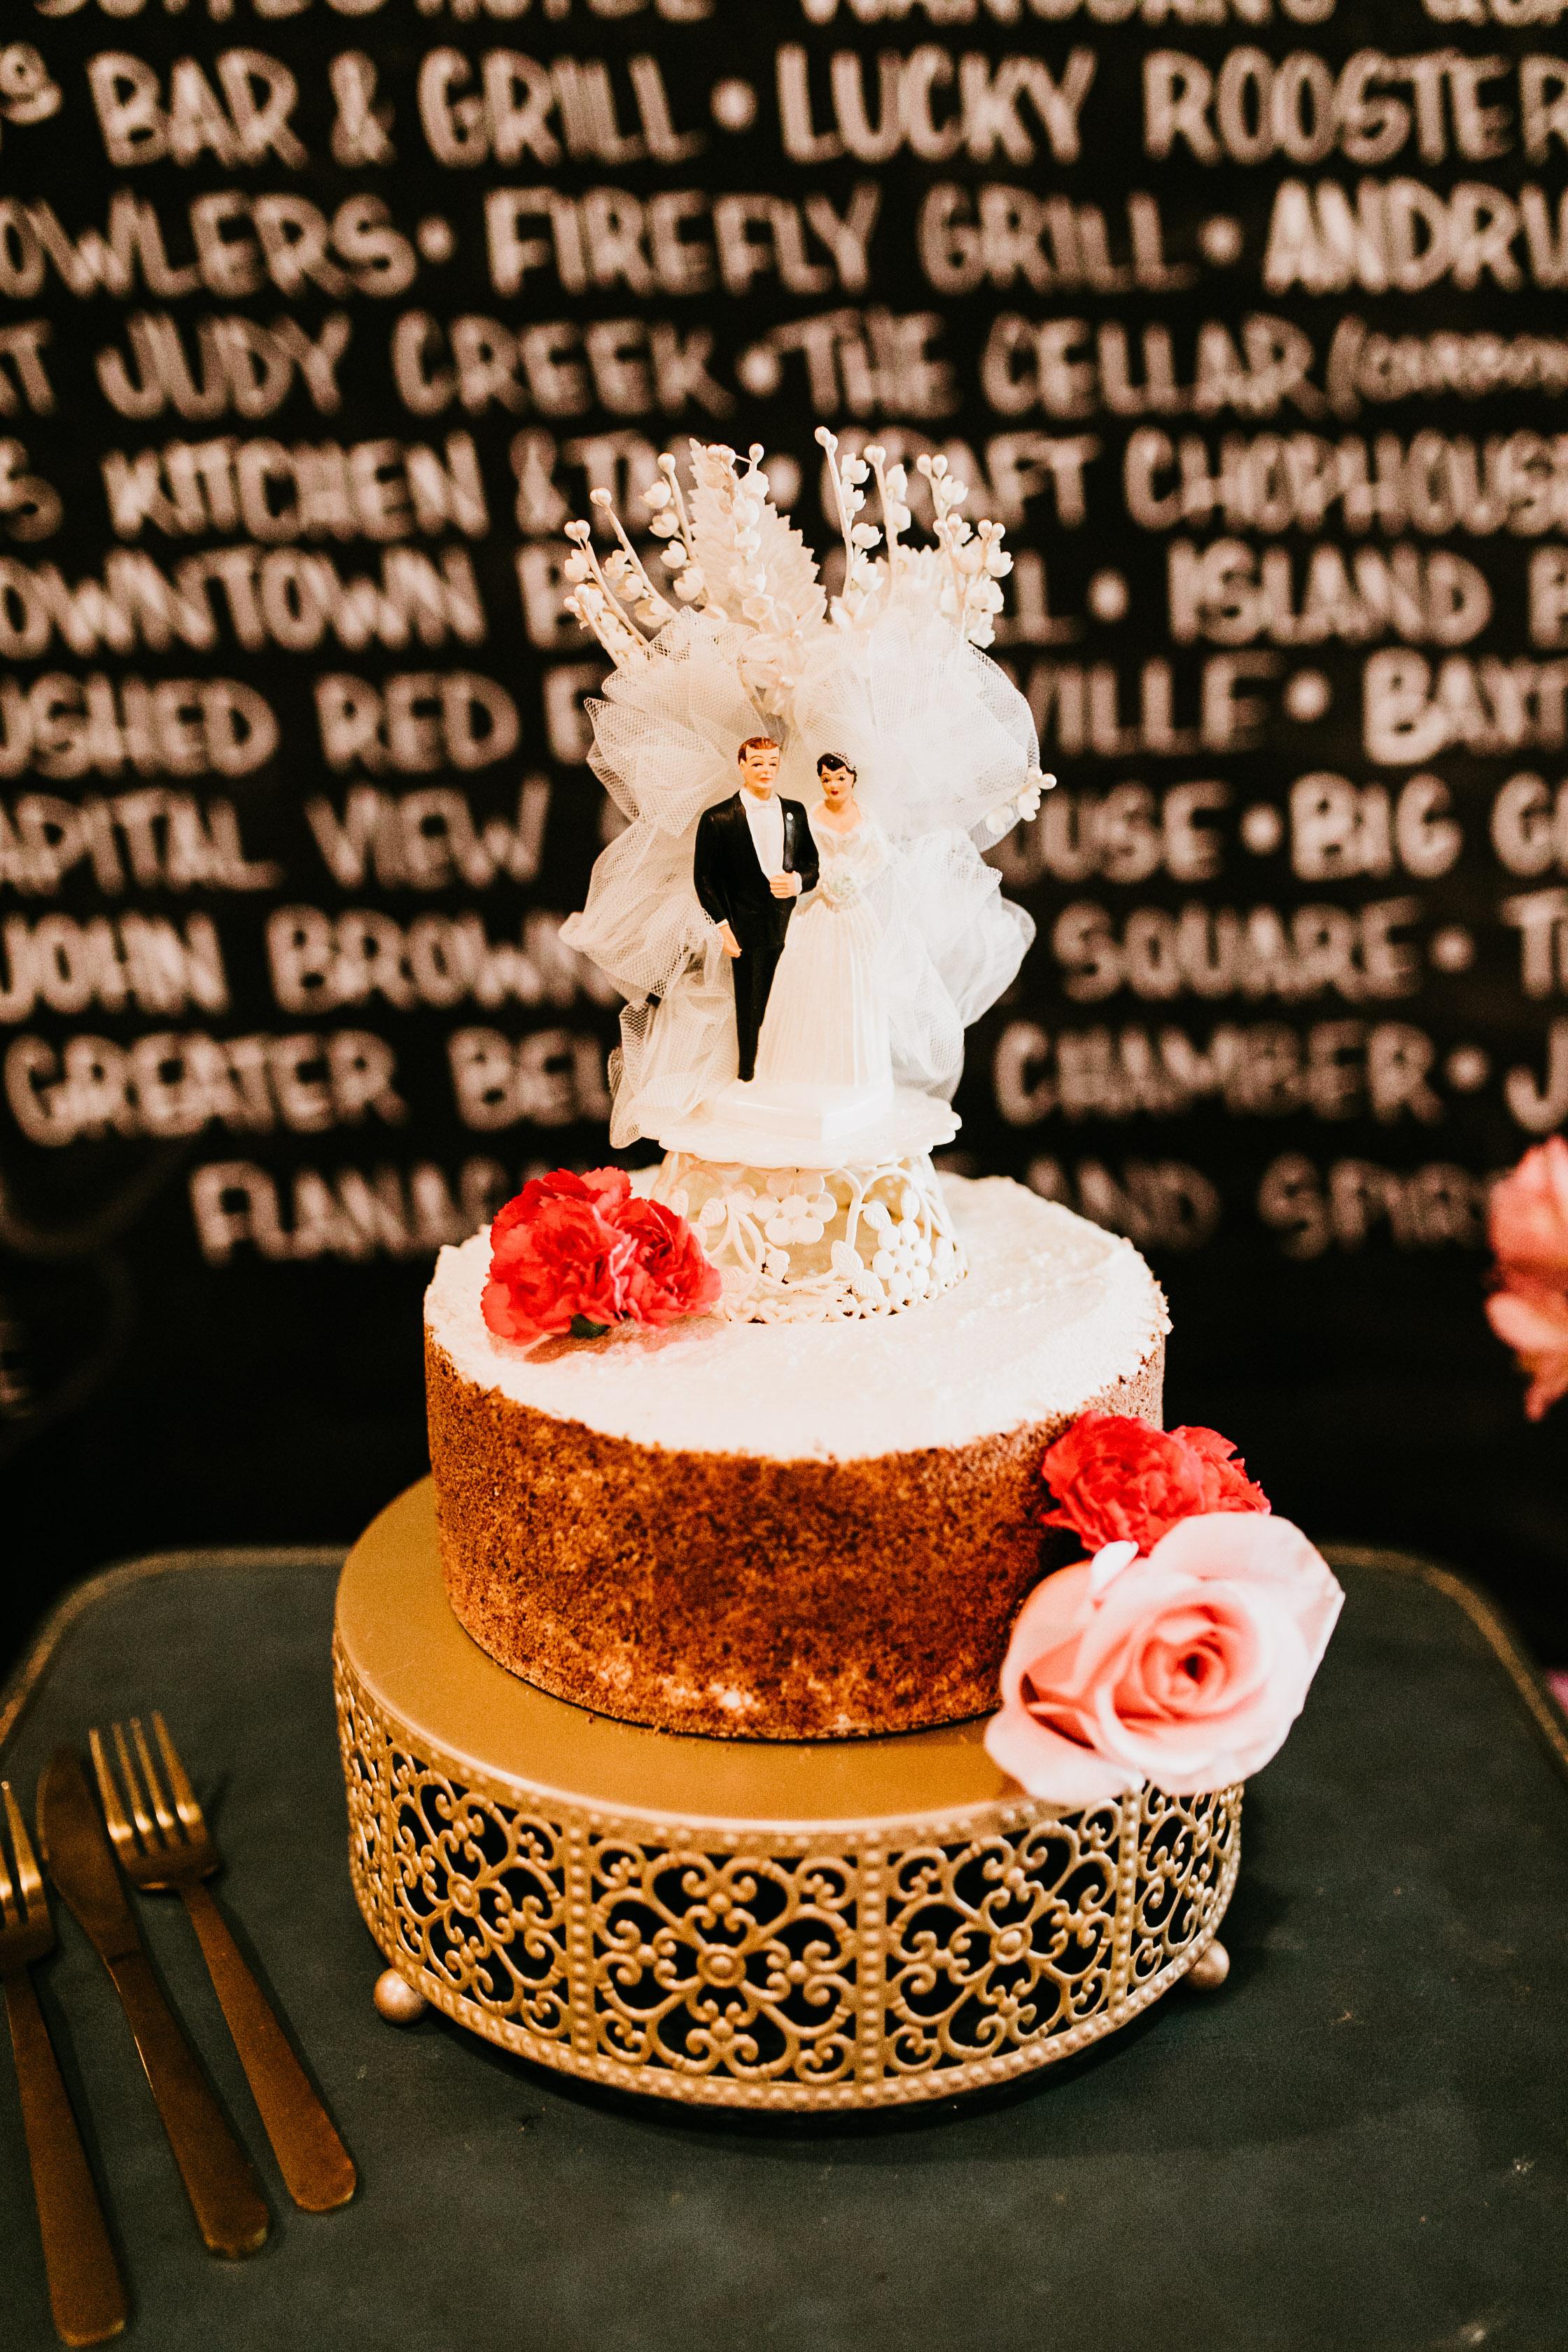 uprooted-traveler-wedding-cake-how-to-have-a-vegan-wedding.jpg